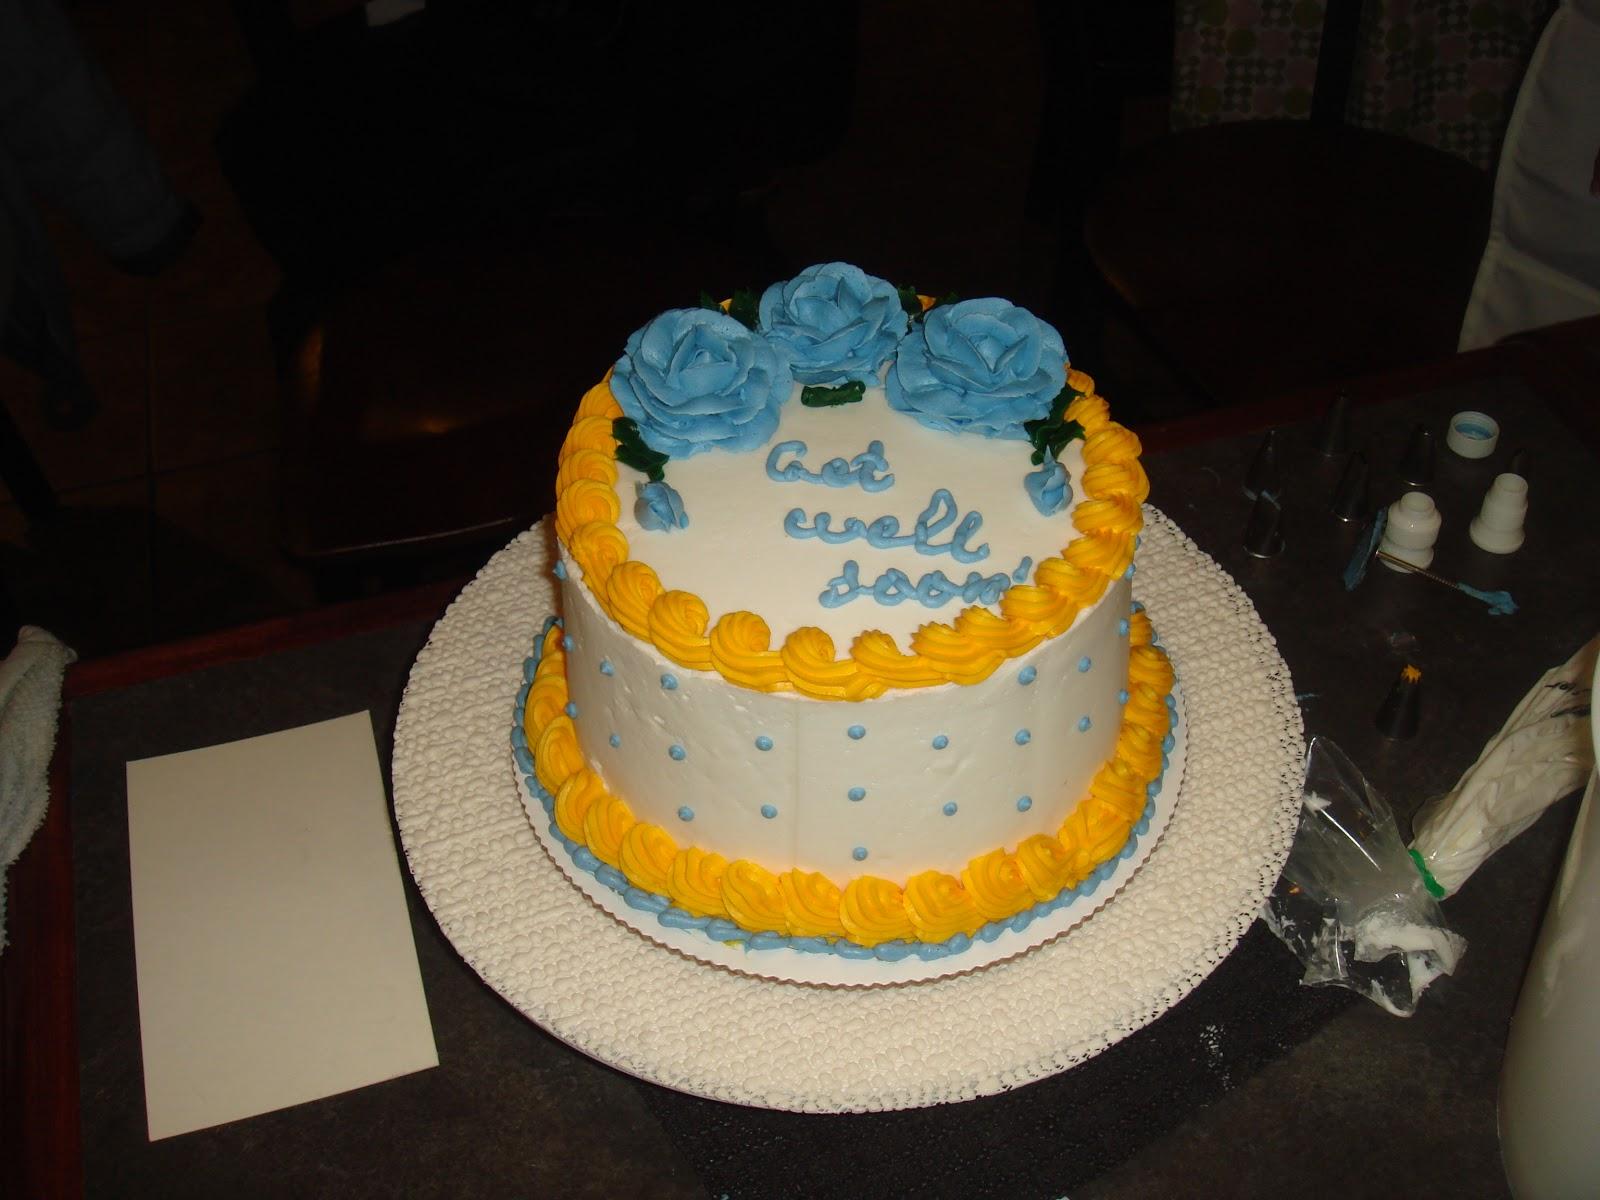 Cake Decorating Classes Princeton Nj : IZA S CAKES: December 2011